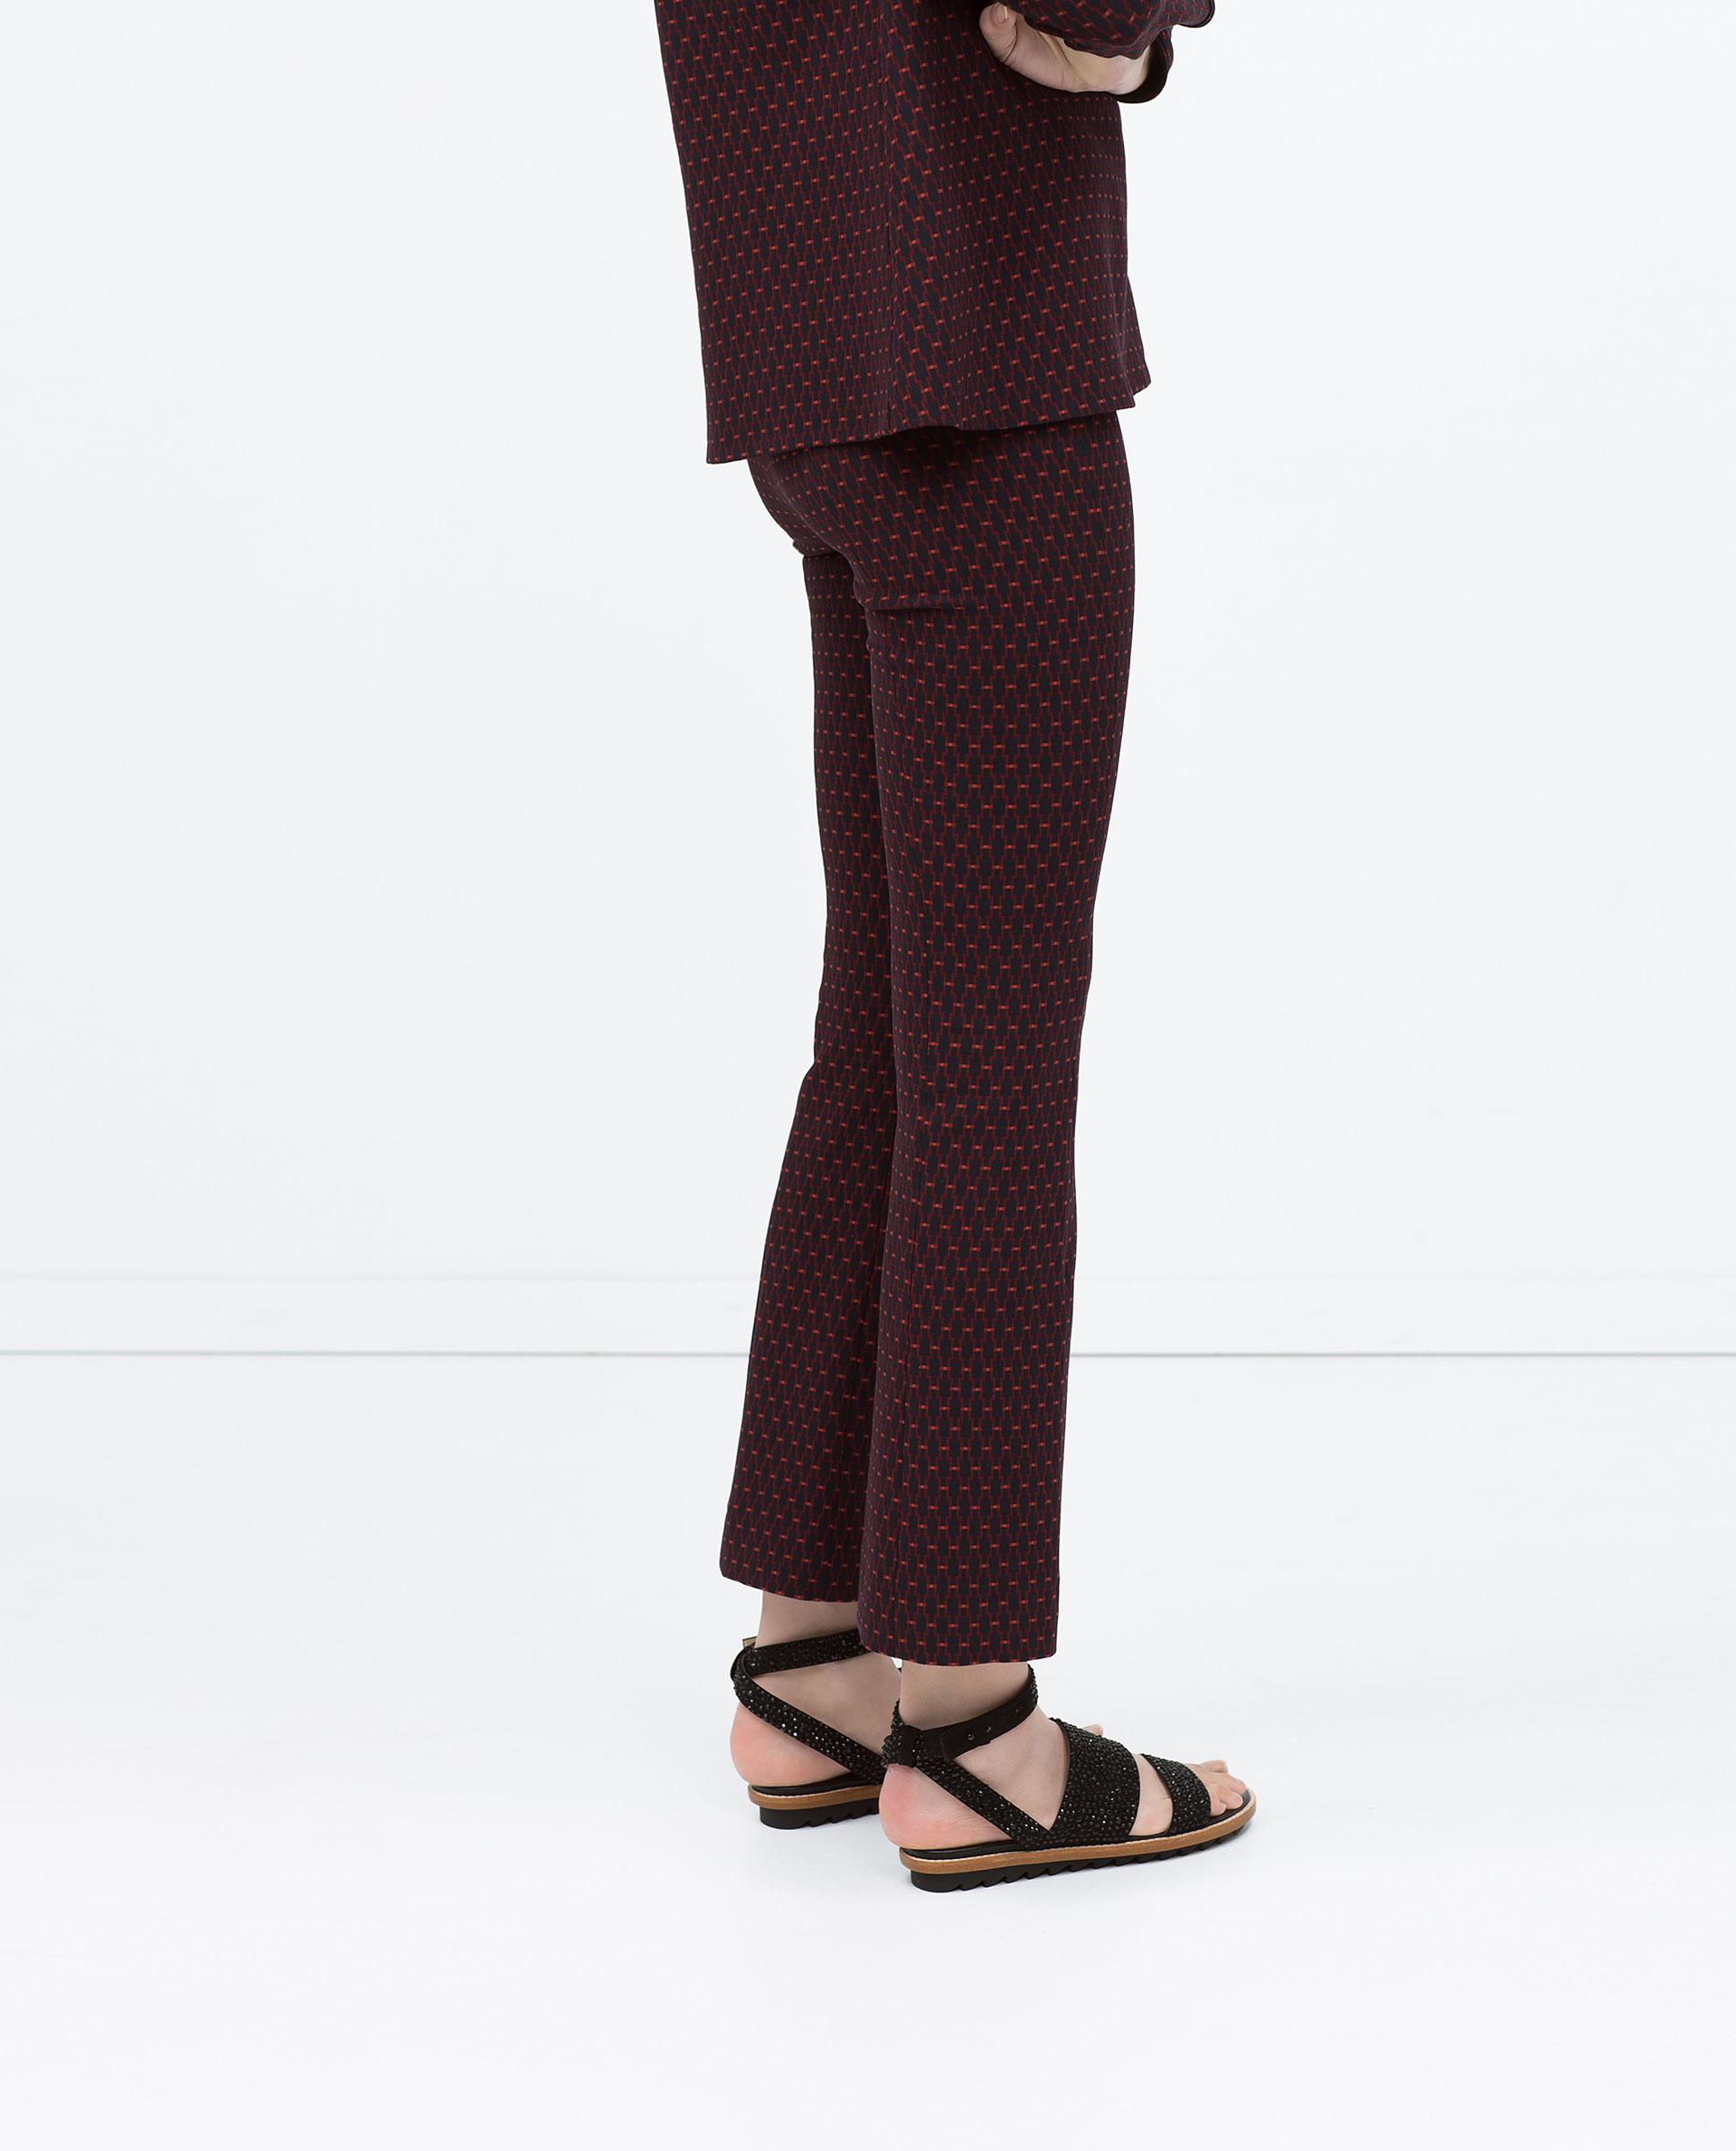 Jacquard bellbottom trousers